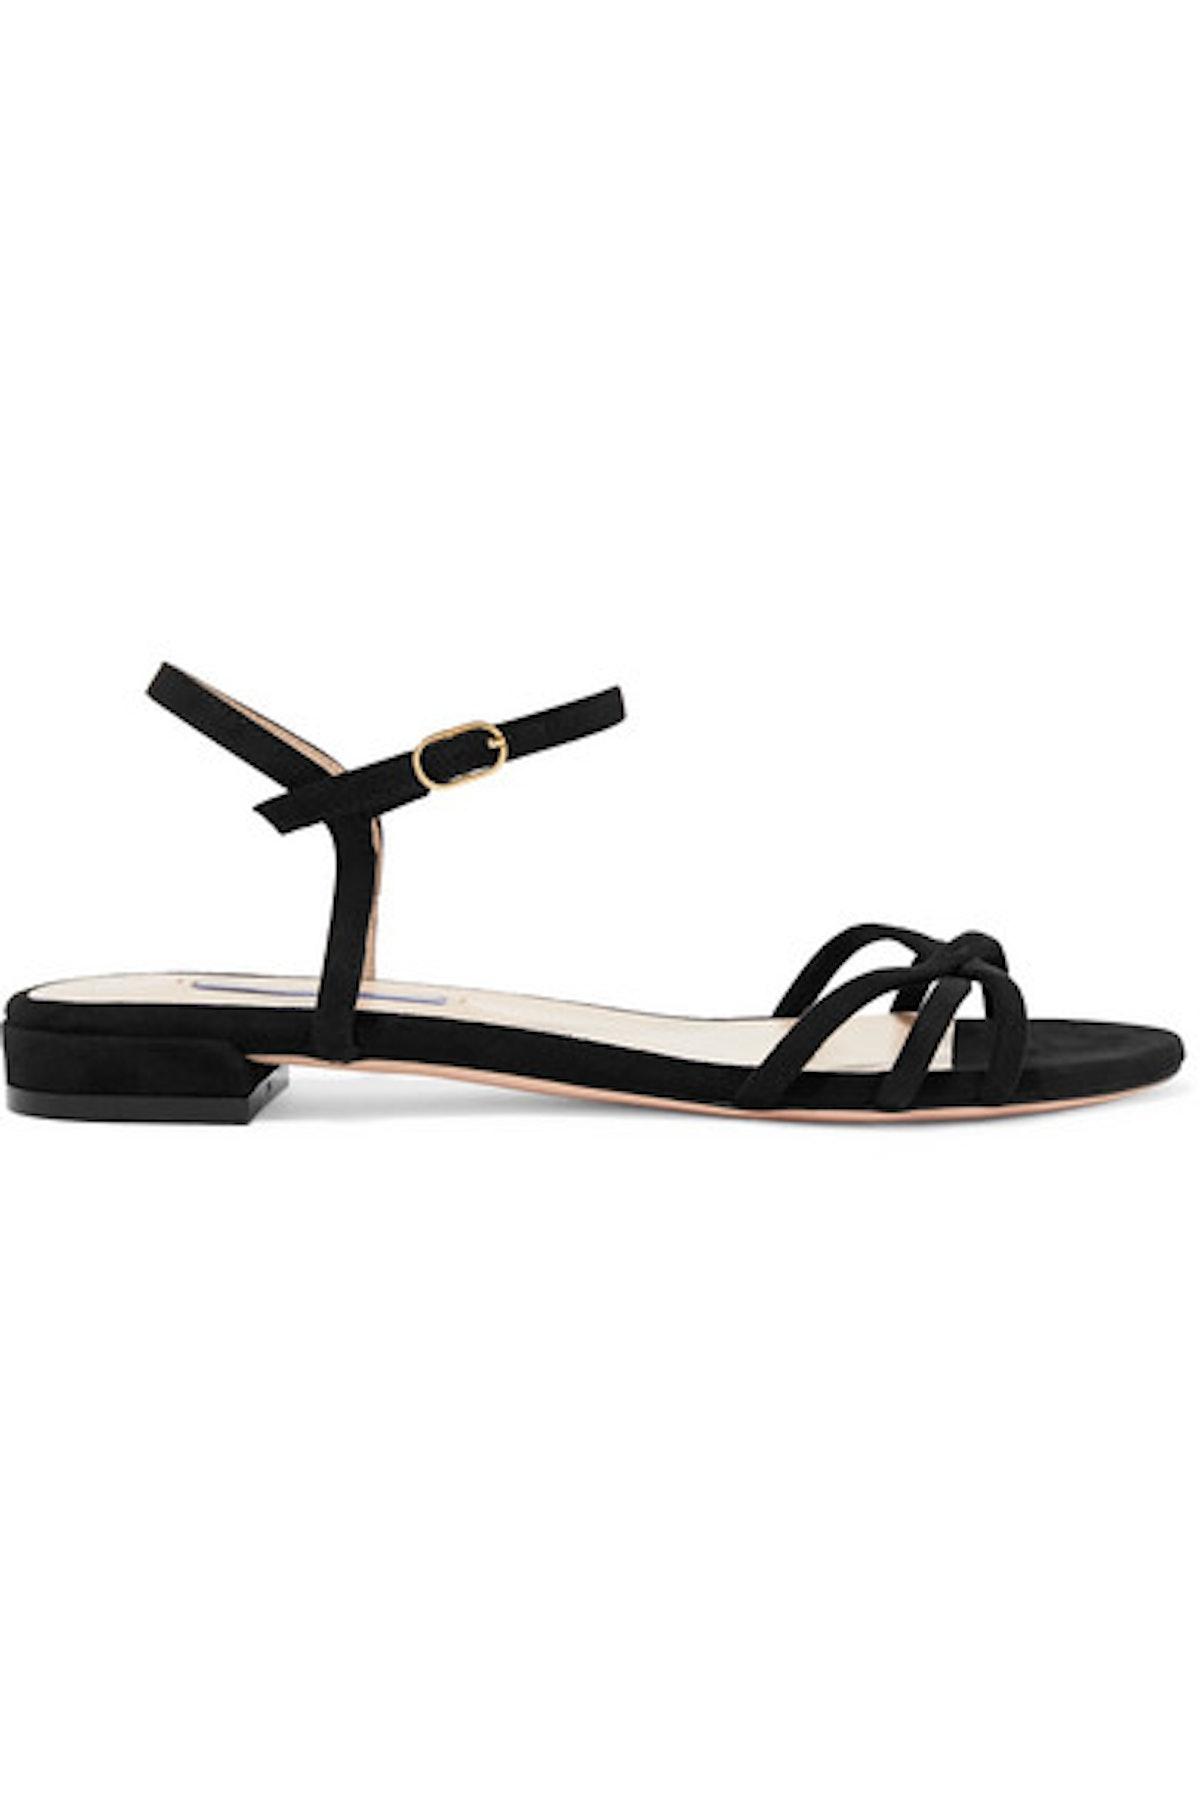 Starla Suede Sandals